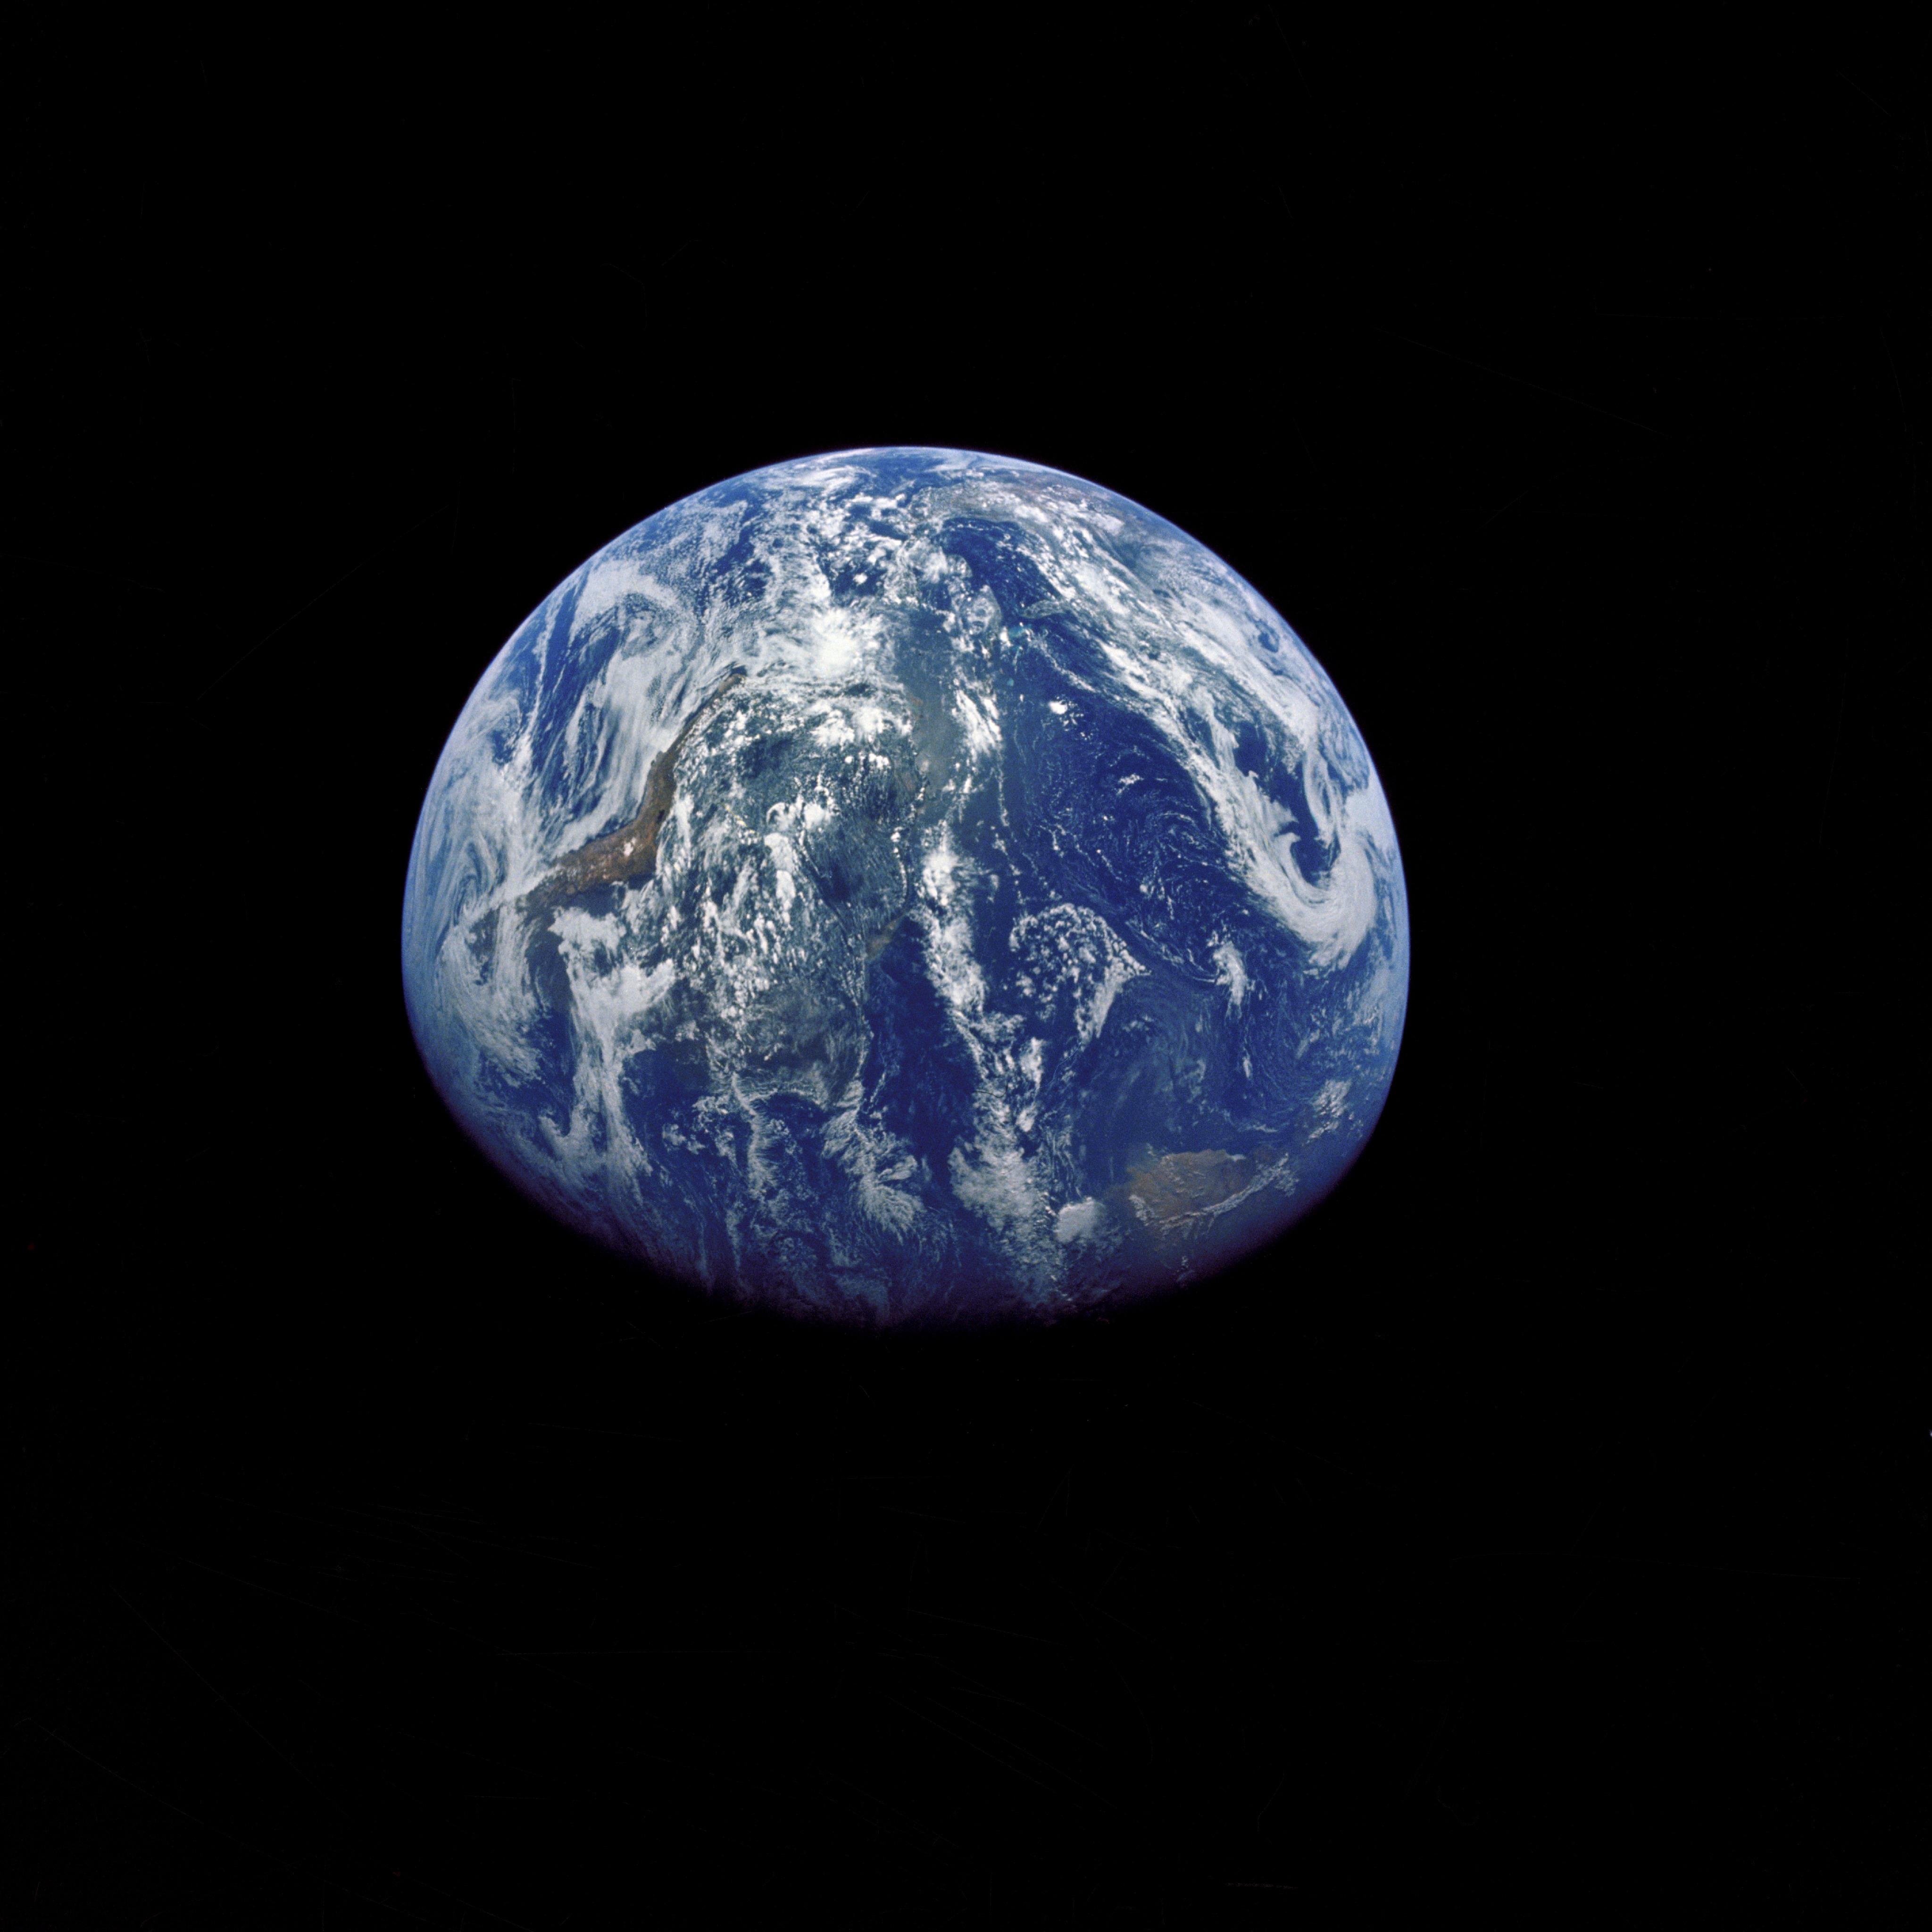 Earth as taken by Apollo 15 crewmembers